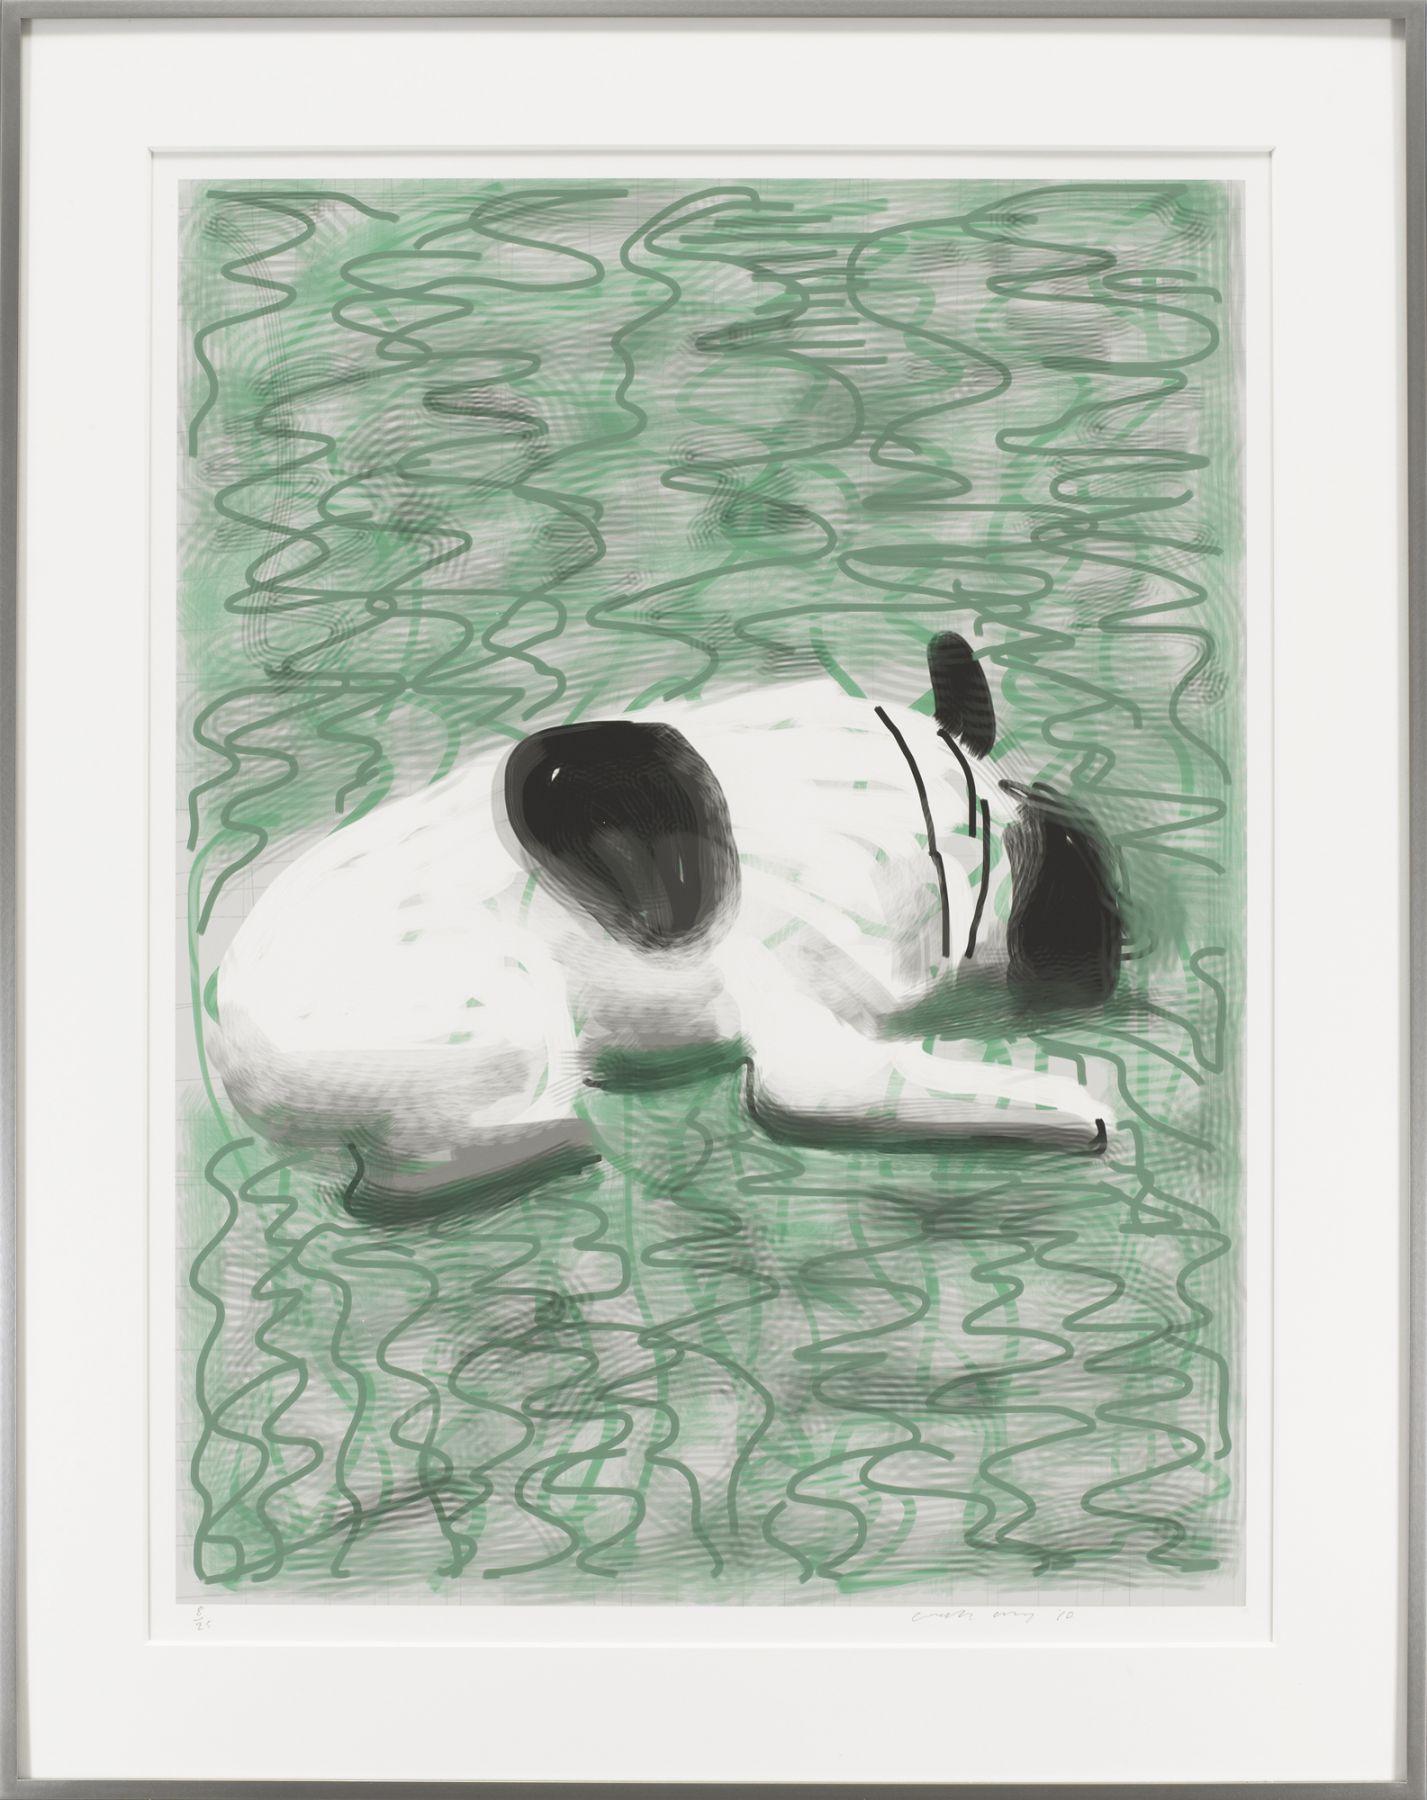 David Hockney, Moujik